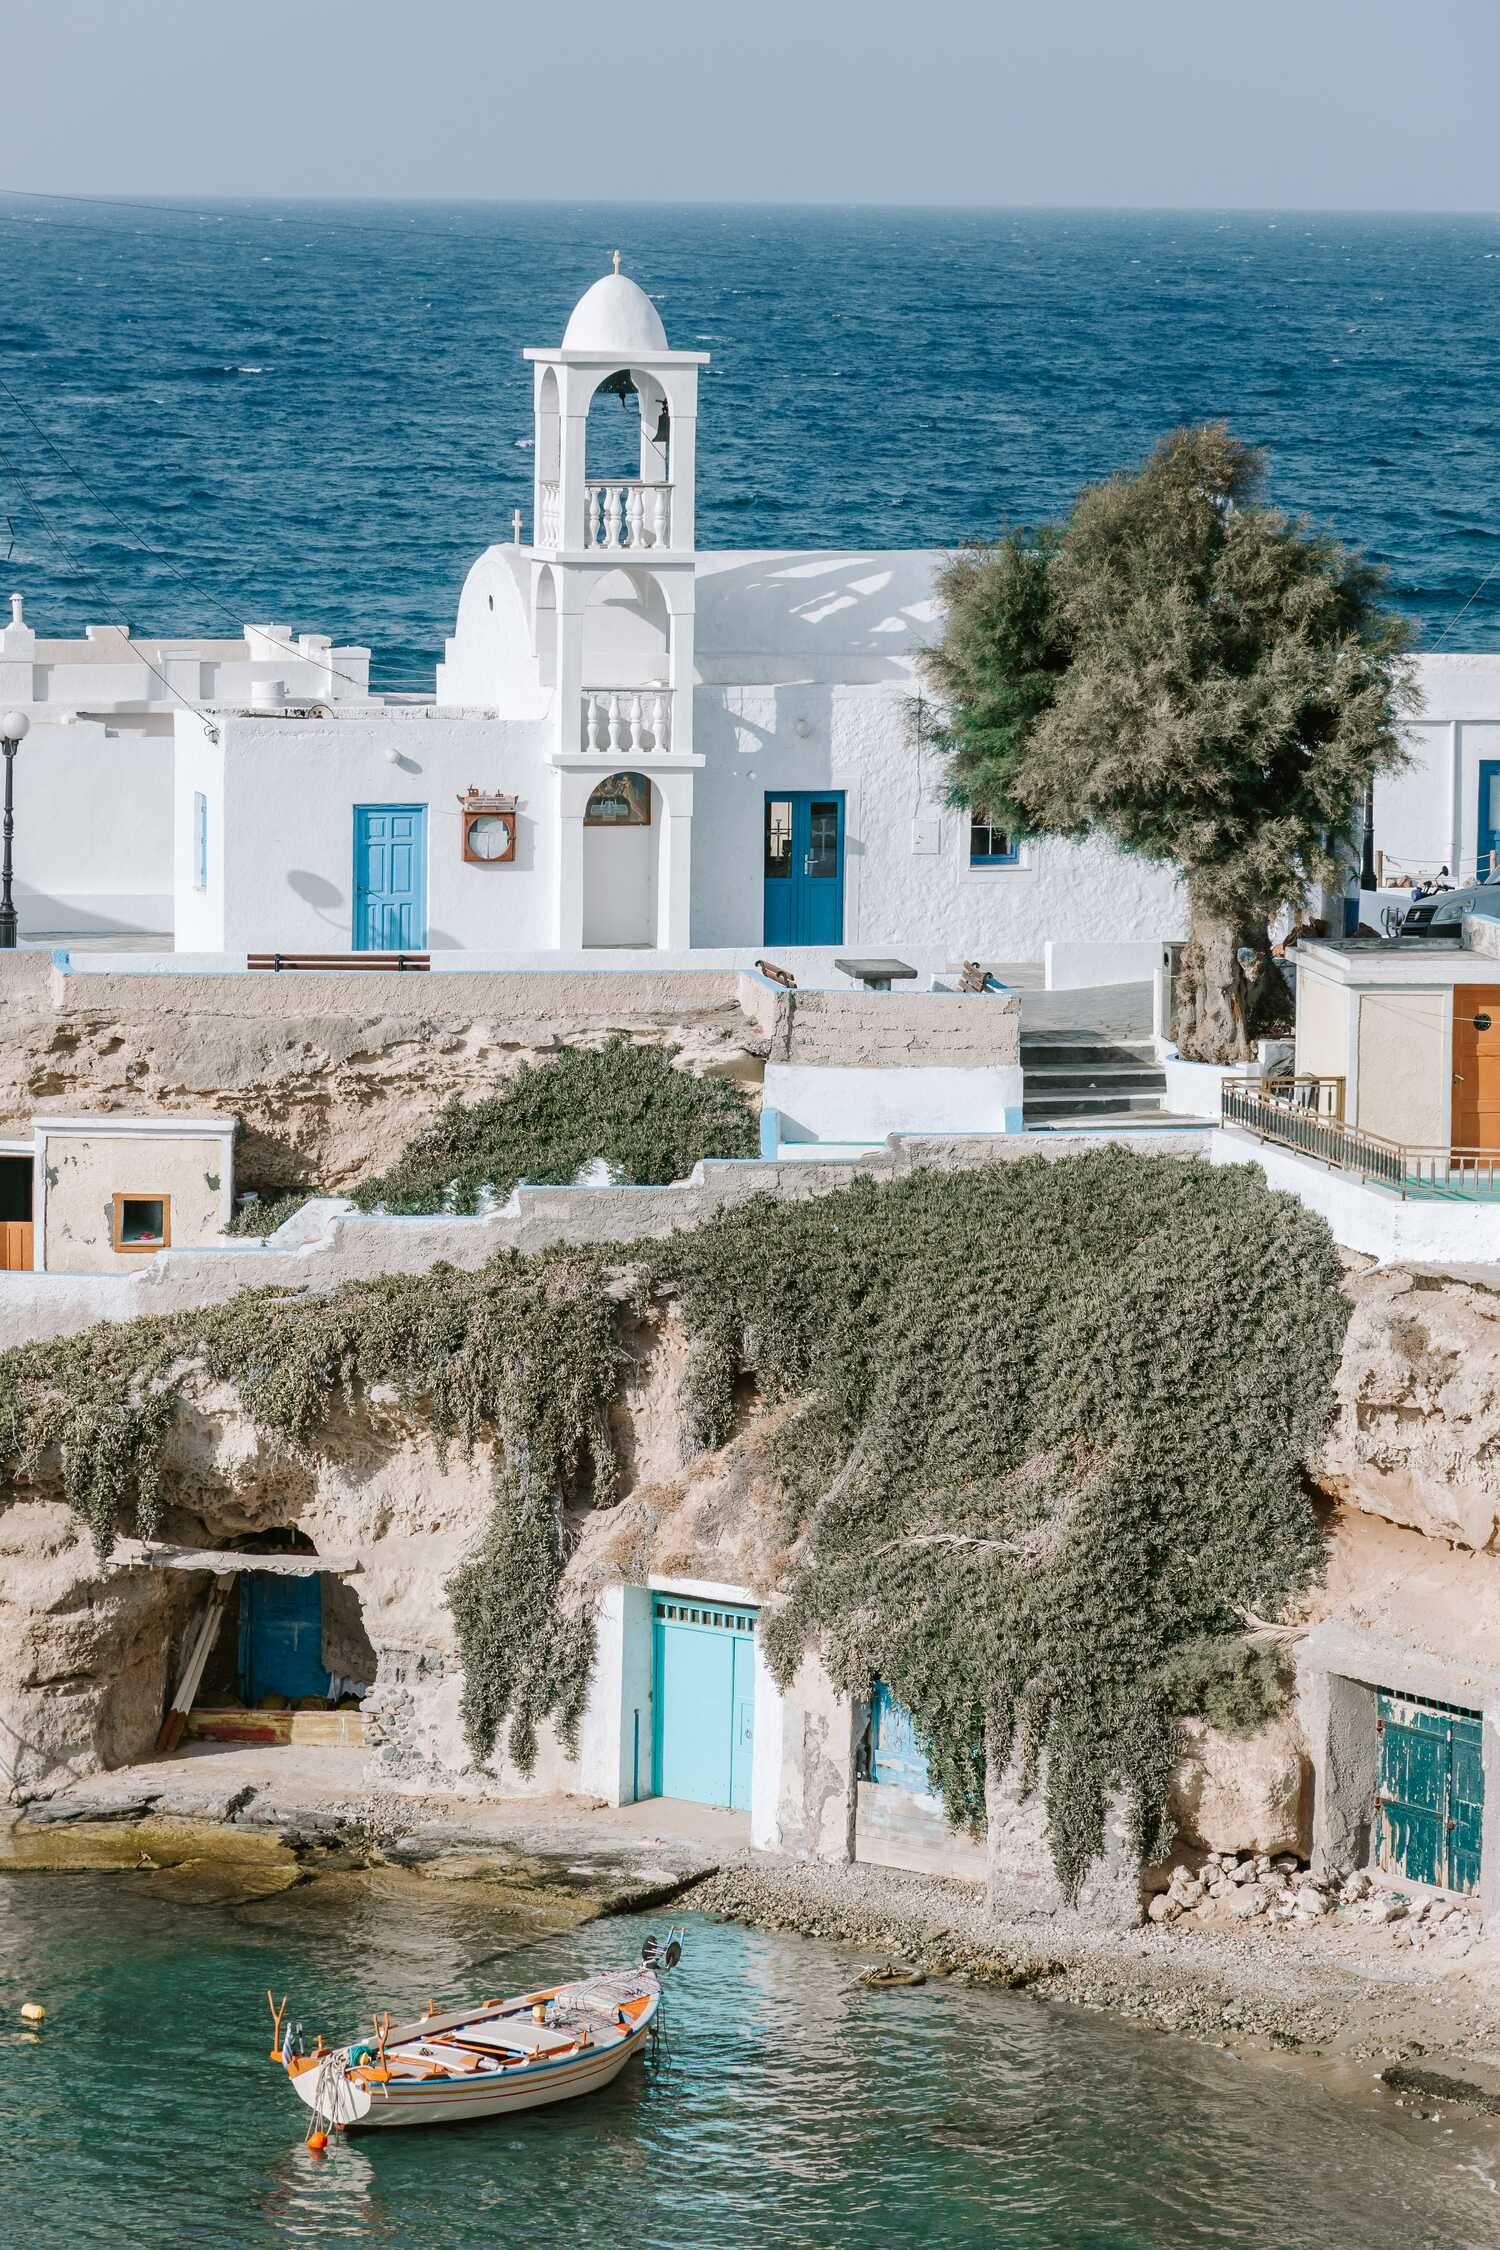 The beautiful small fishing village of Madrakia on the Greek island of Milos